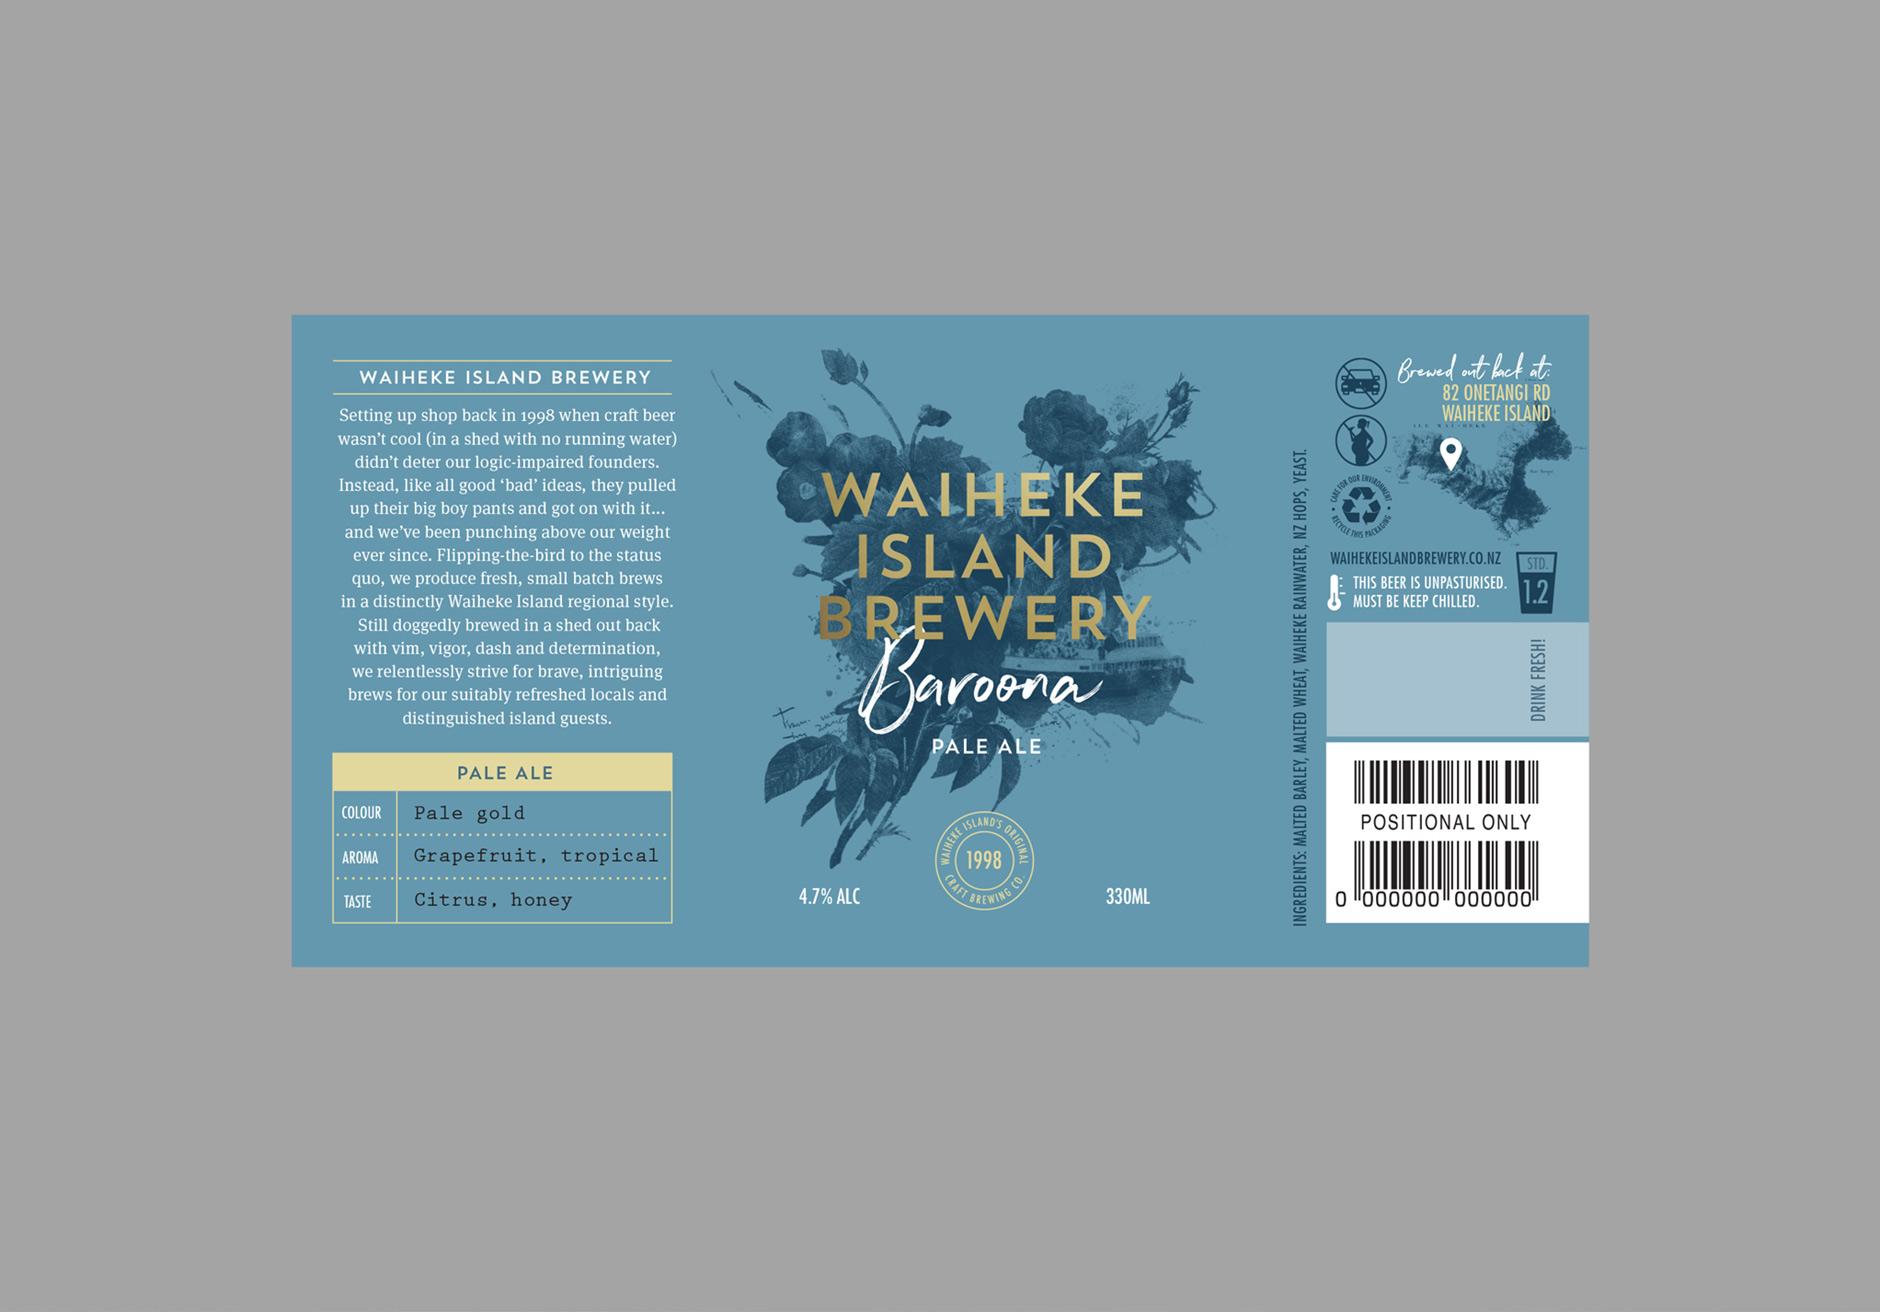 Waiheke Island Brewery Baroona beer